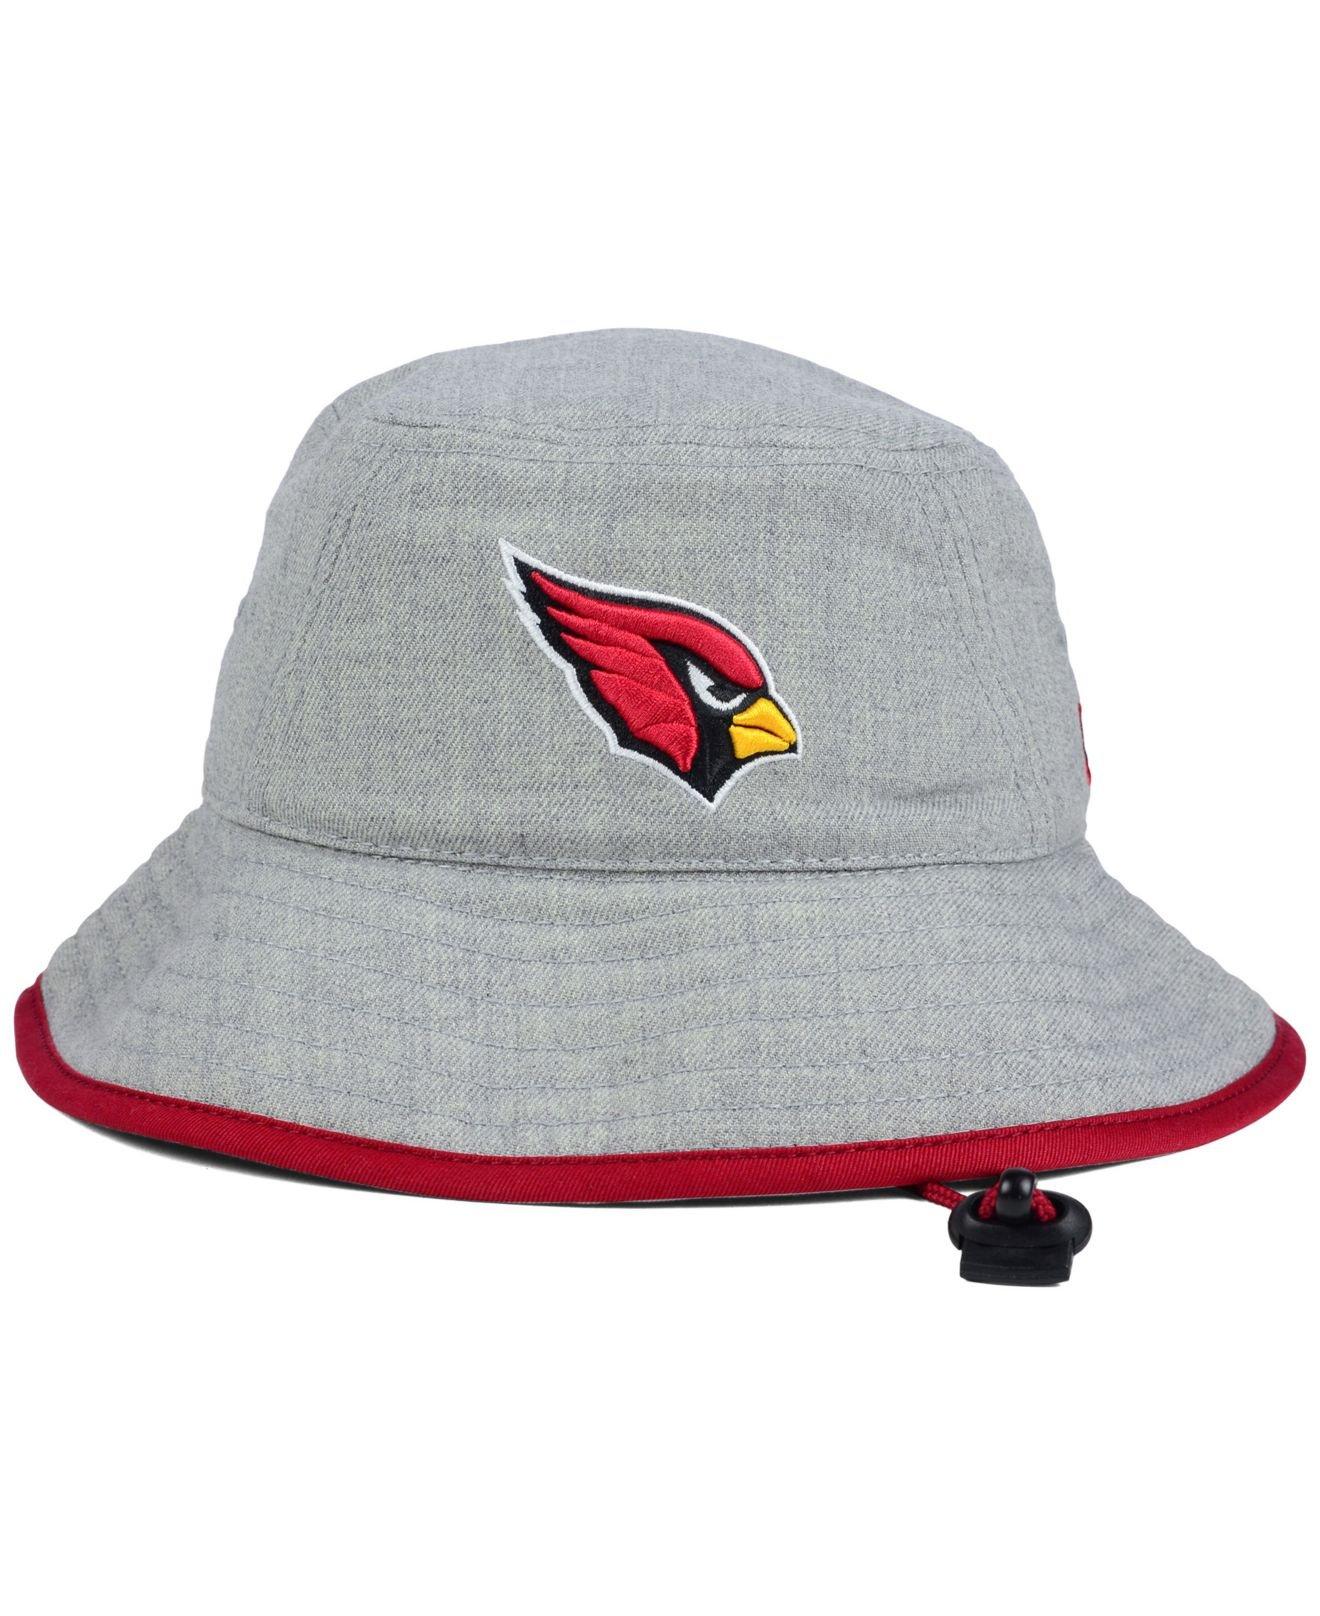 7d0ce4e9 KTZ Arizona Cardinals Nfl Heather Gray Bucket Hat for men